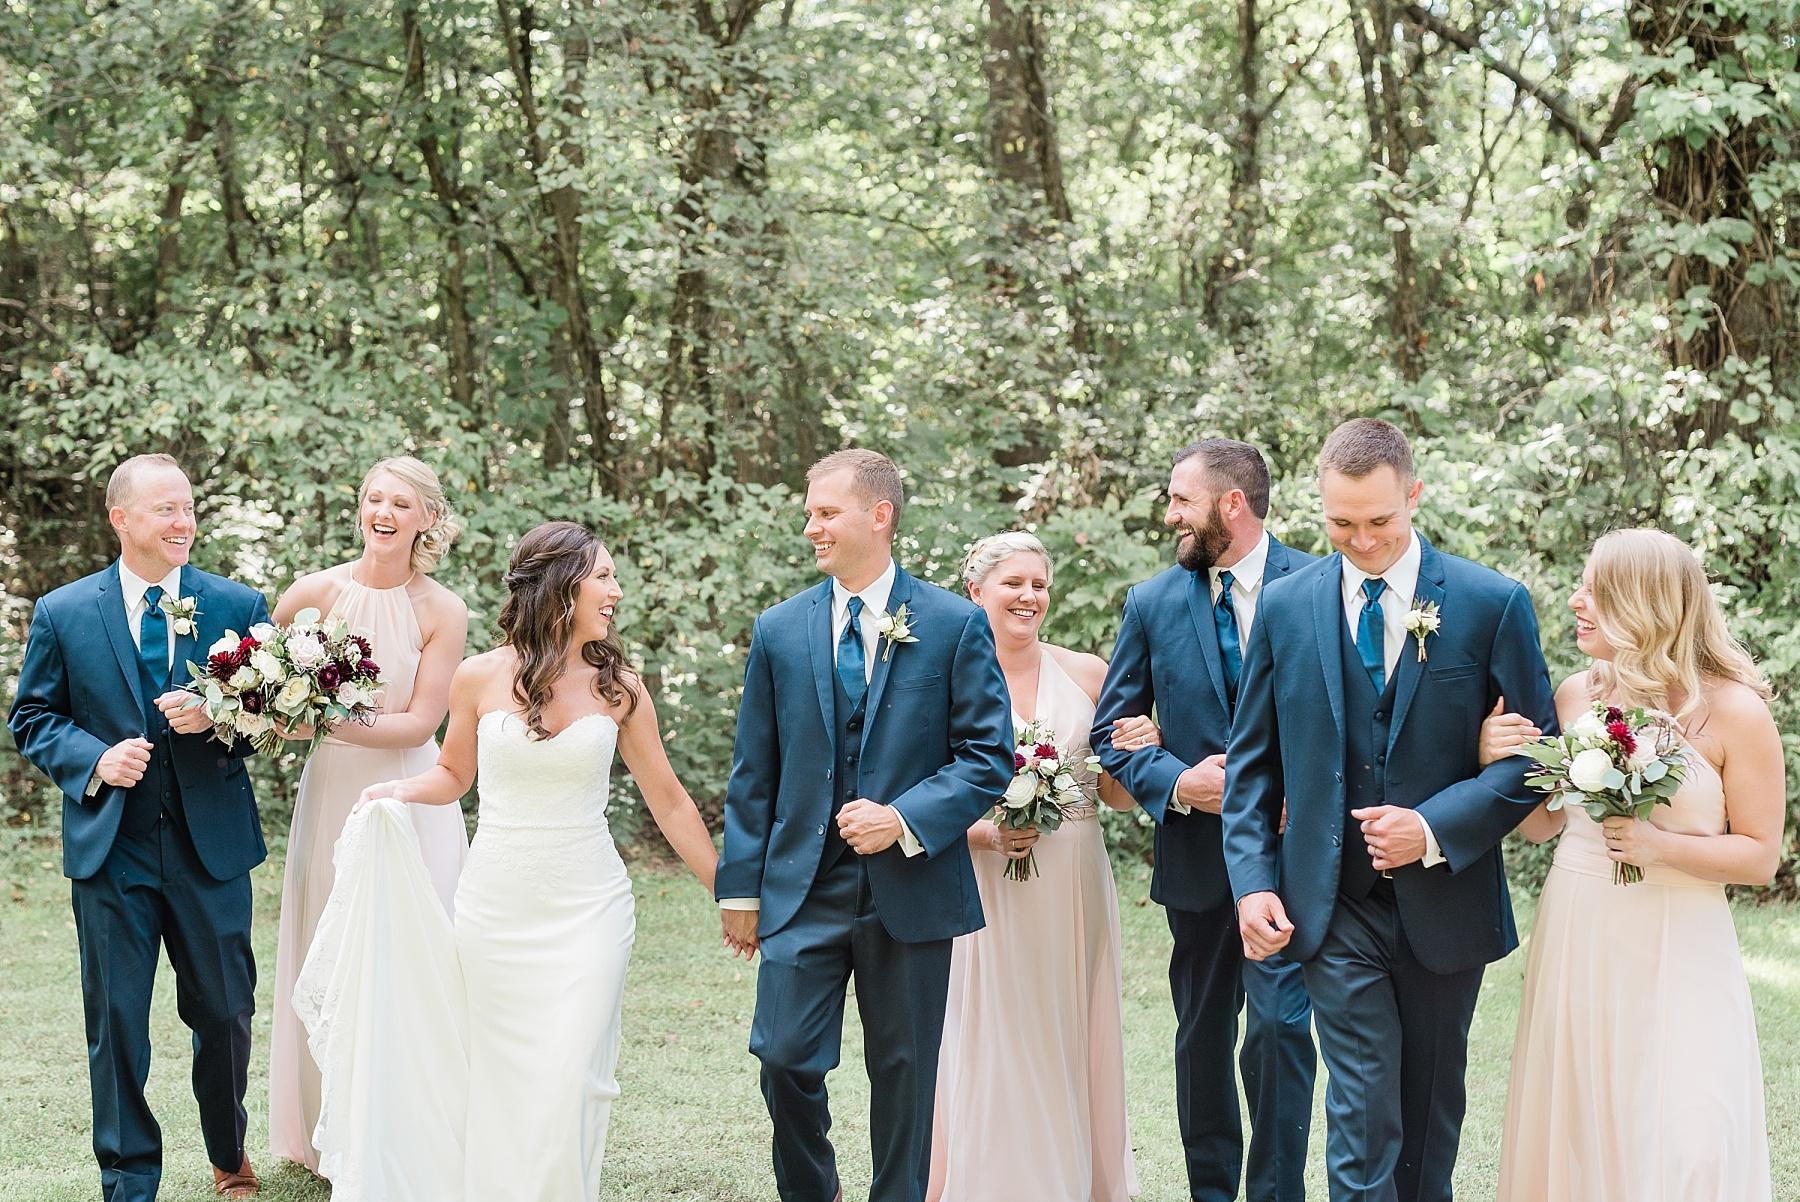 Romantic Summer Sunset Wedding Ceremony at Little Piney Lodge St. Louis Missouri by Kelsi Kliethermes Photography Fine Art Photographer_0003.jpg